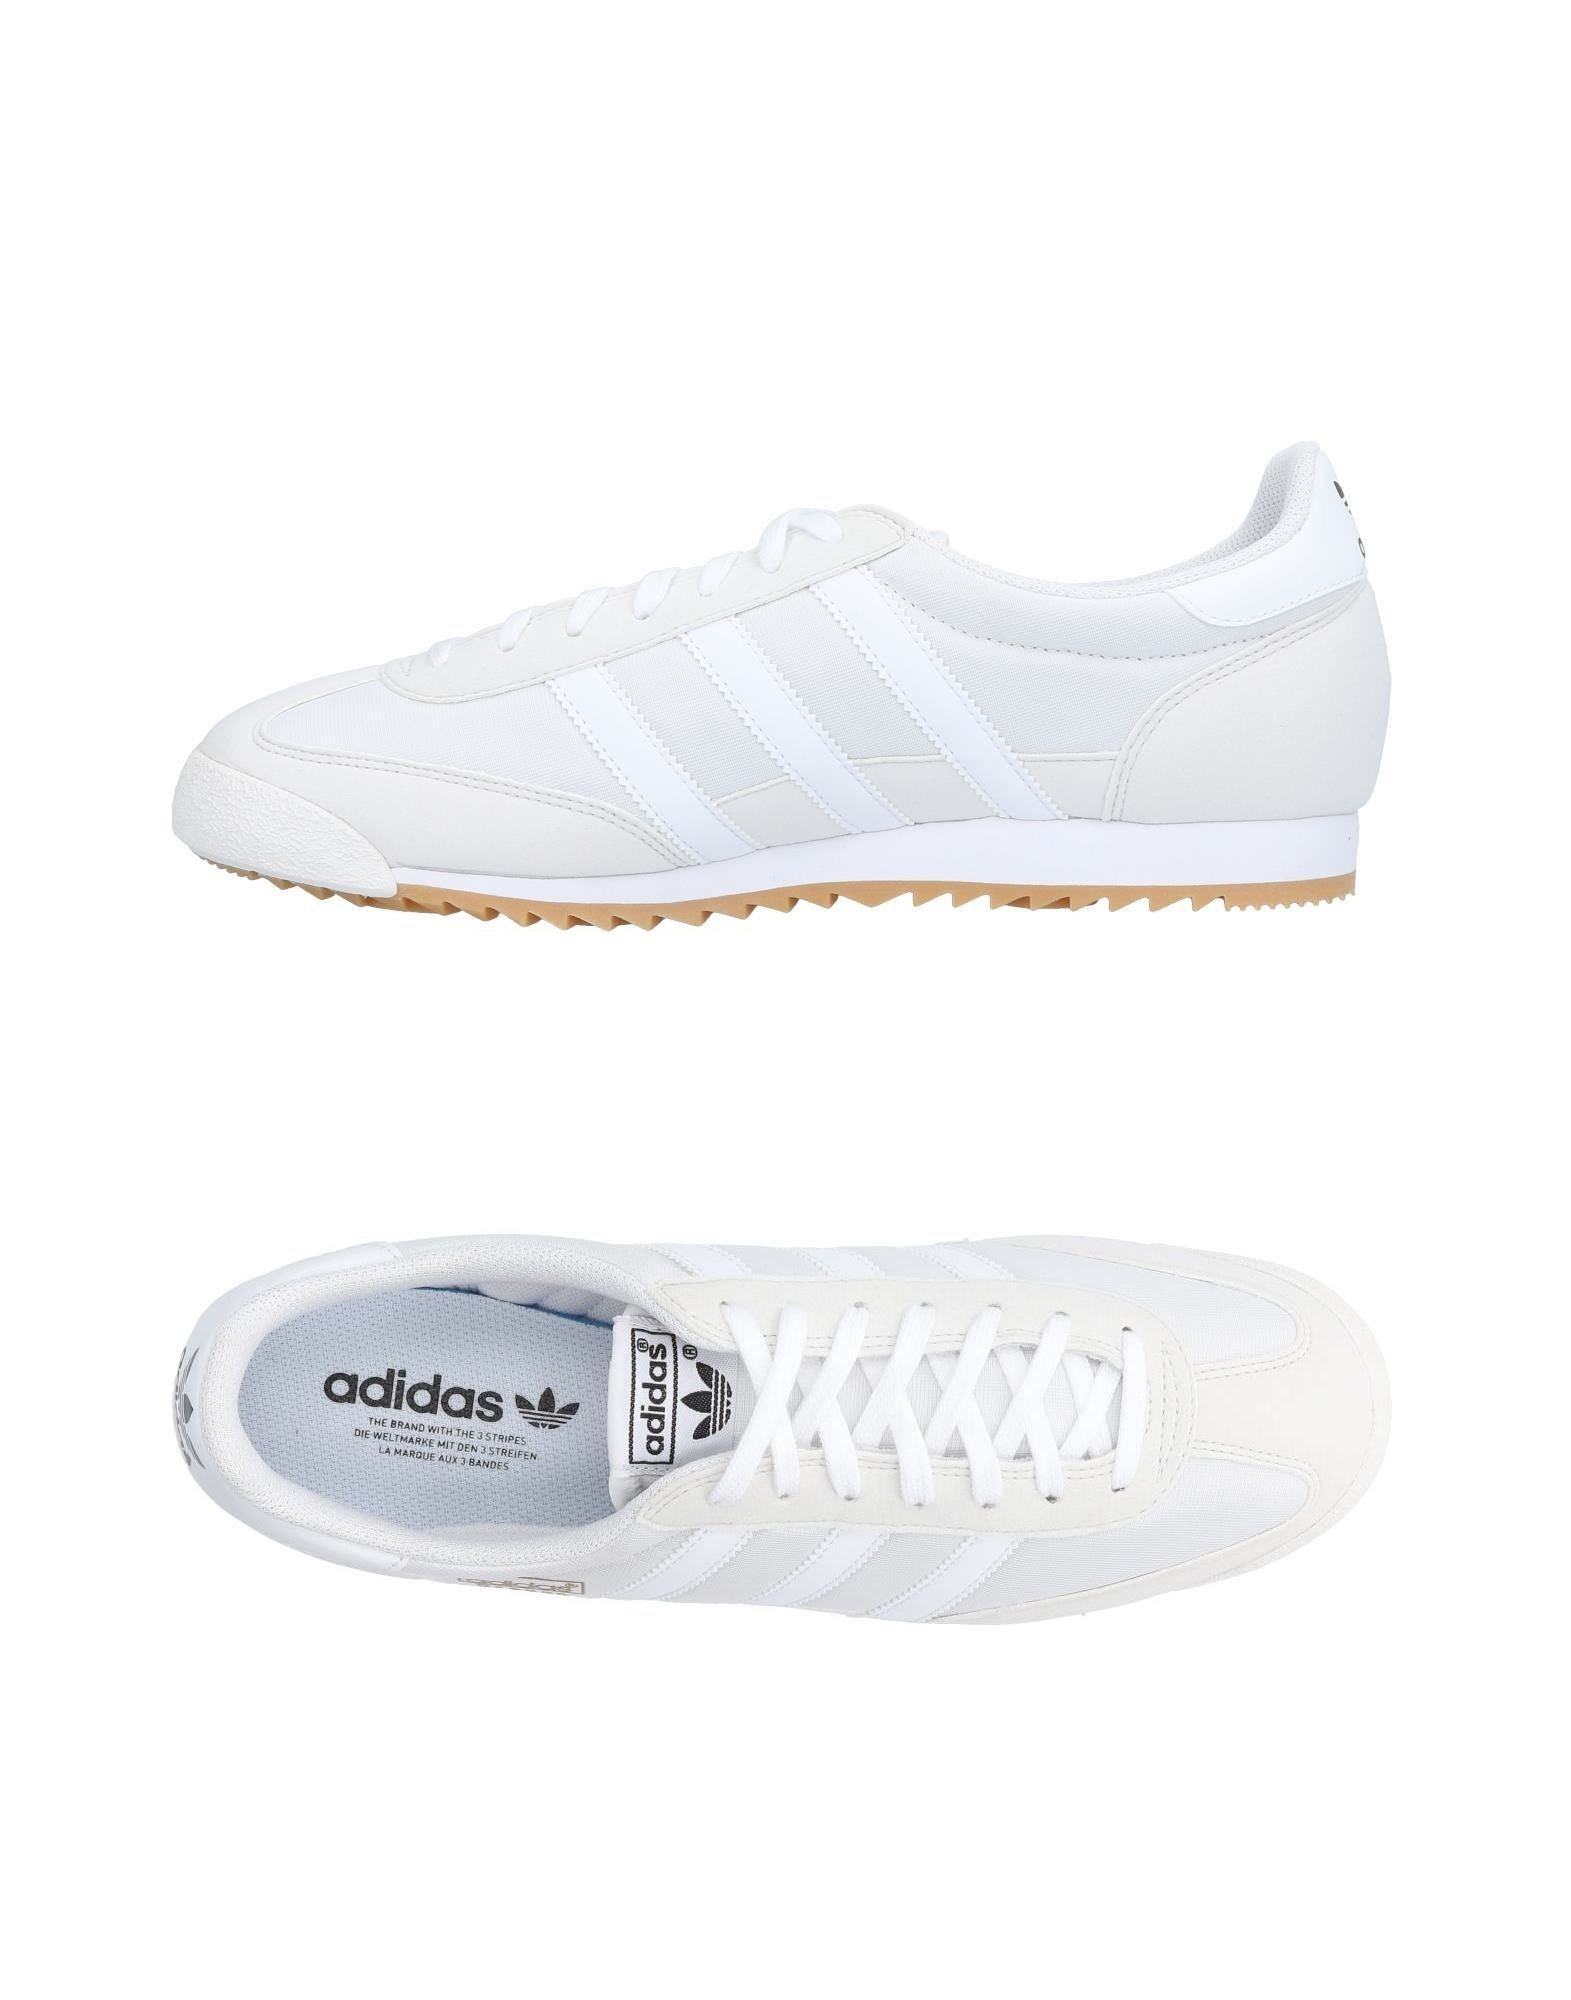 Adidas Originals Sneakers - Men Men Men Adidas Originals Sneakers online on  United Kingdom - 11462396BX 776b27